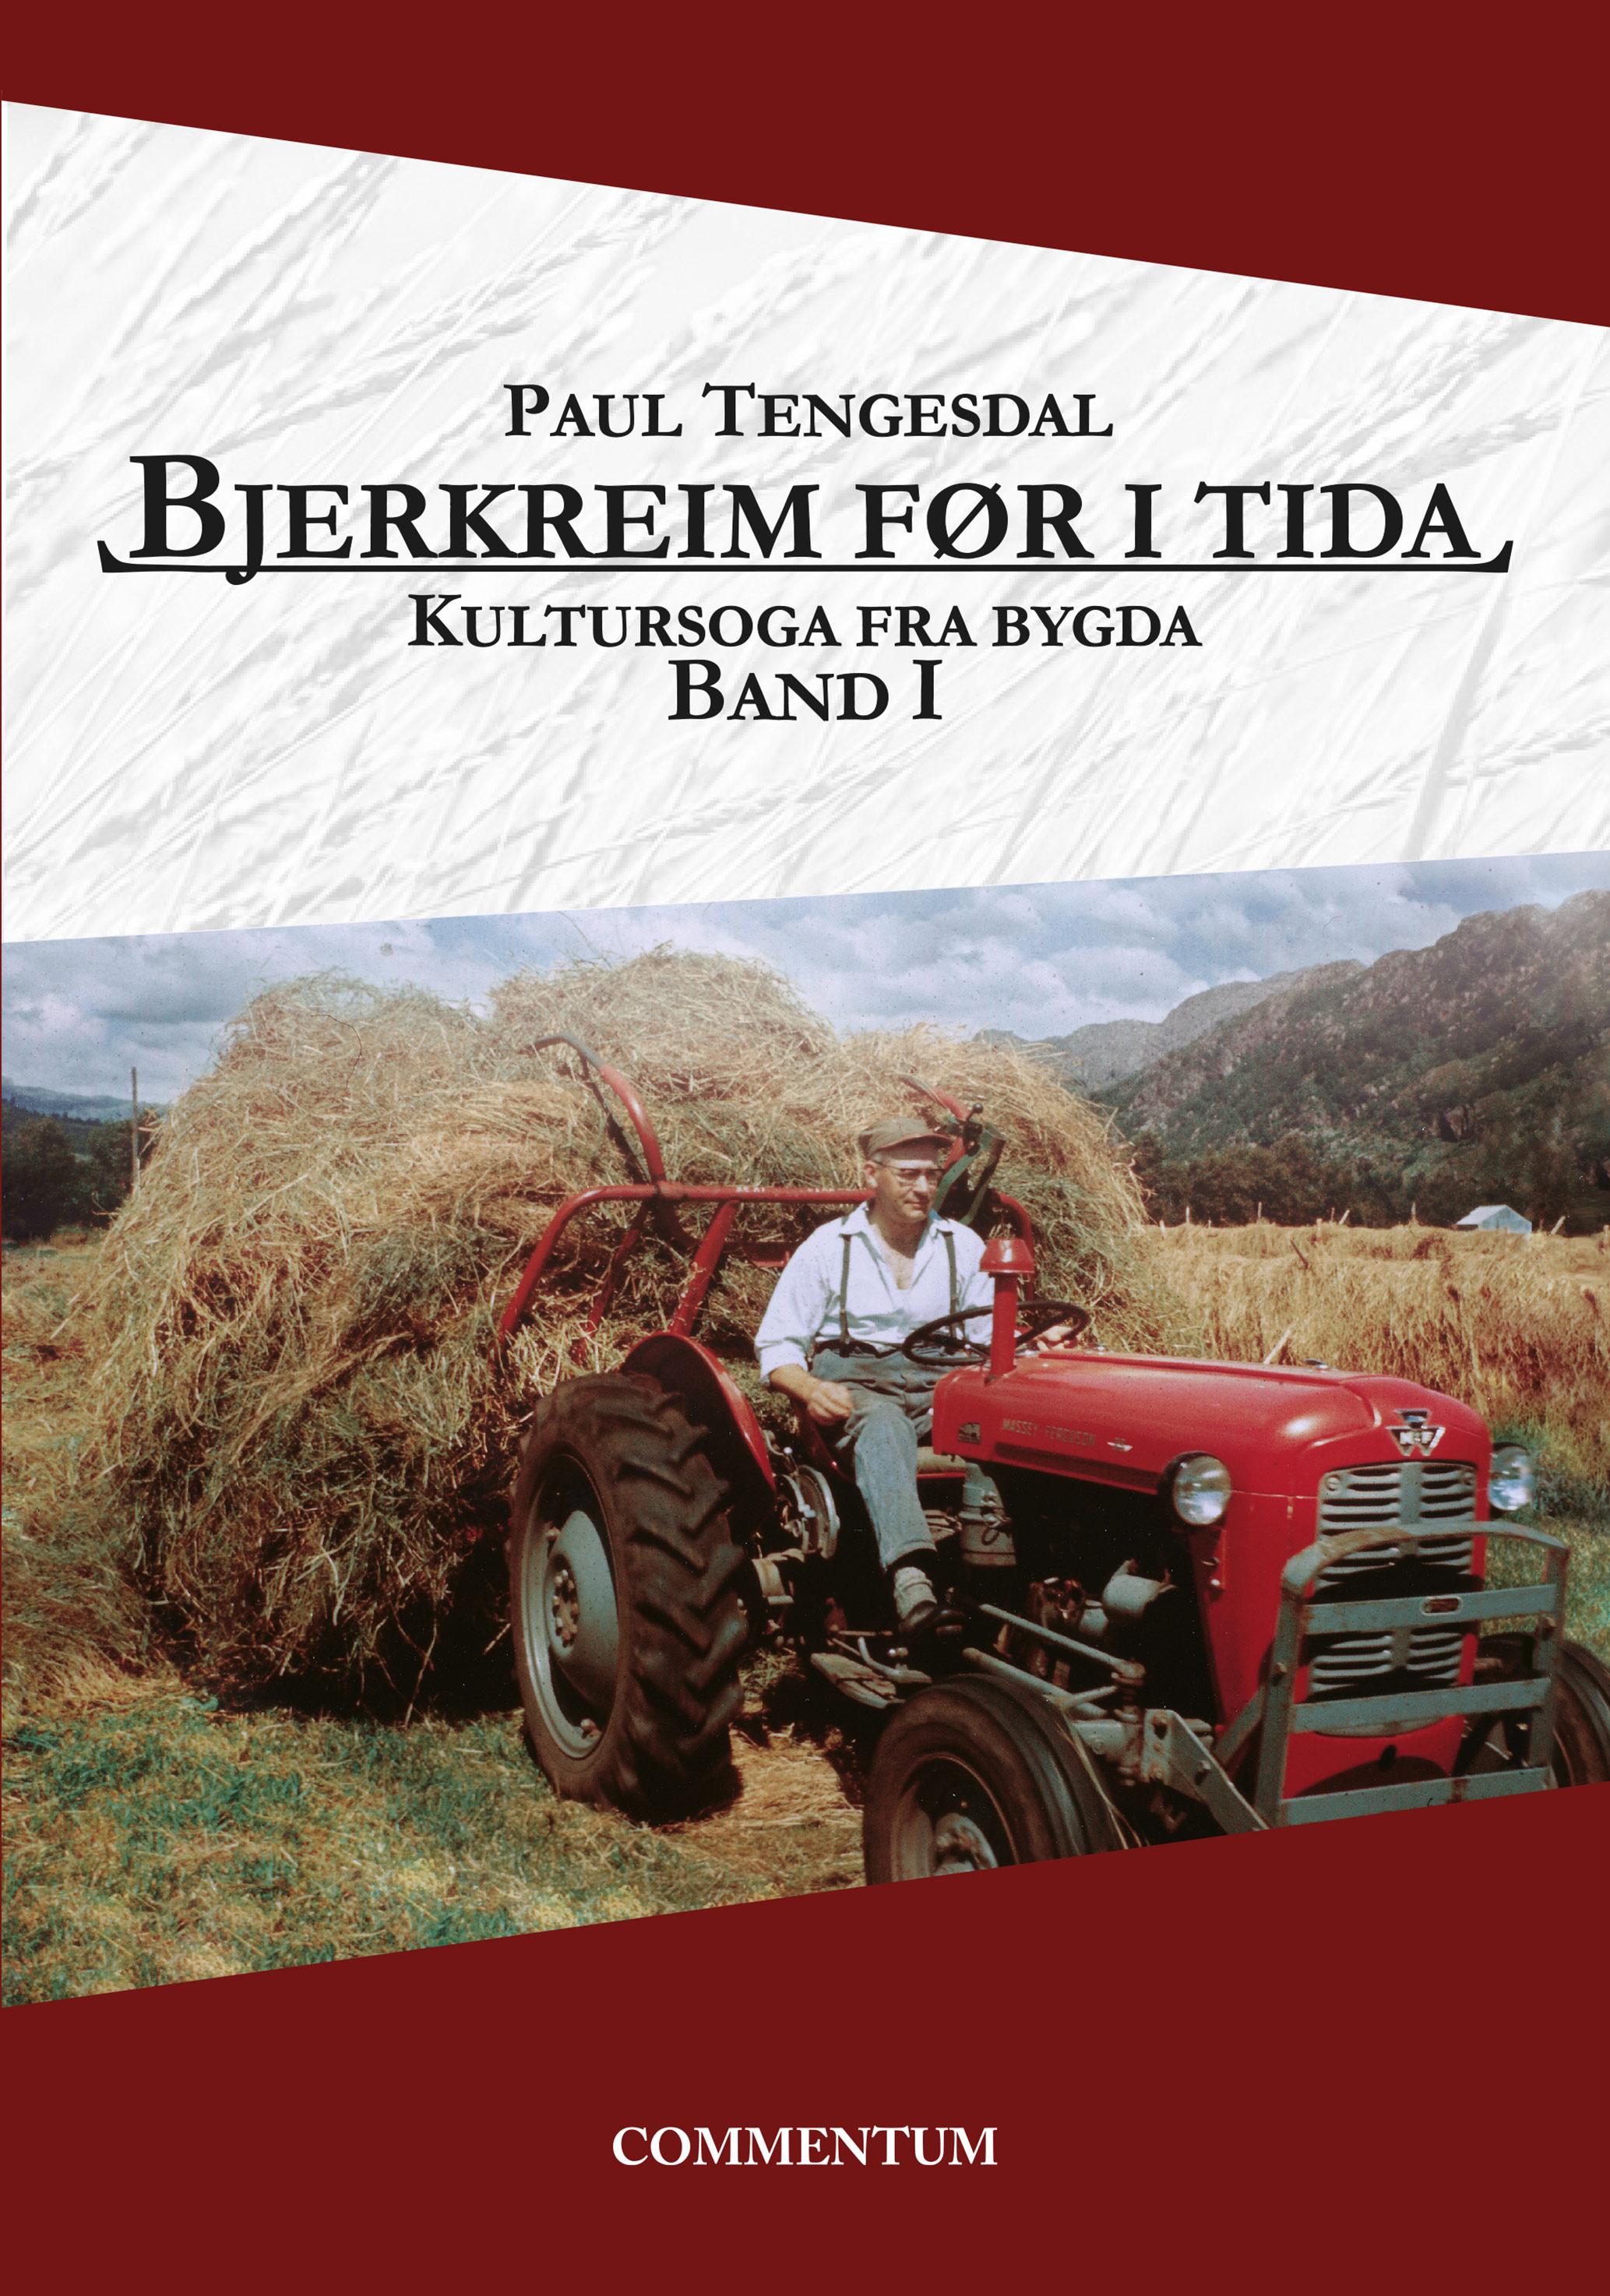 Bjerkreim før i tida. Kultursoga fra bygda. Band I